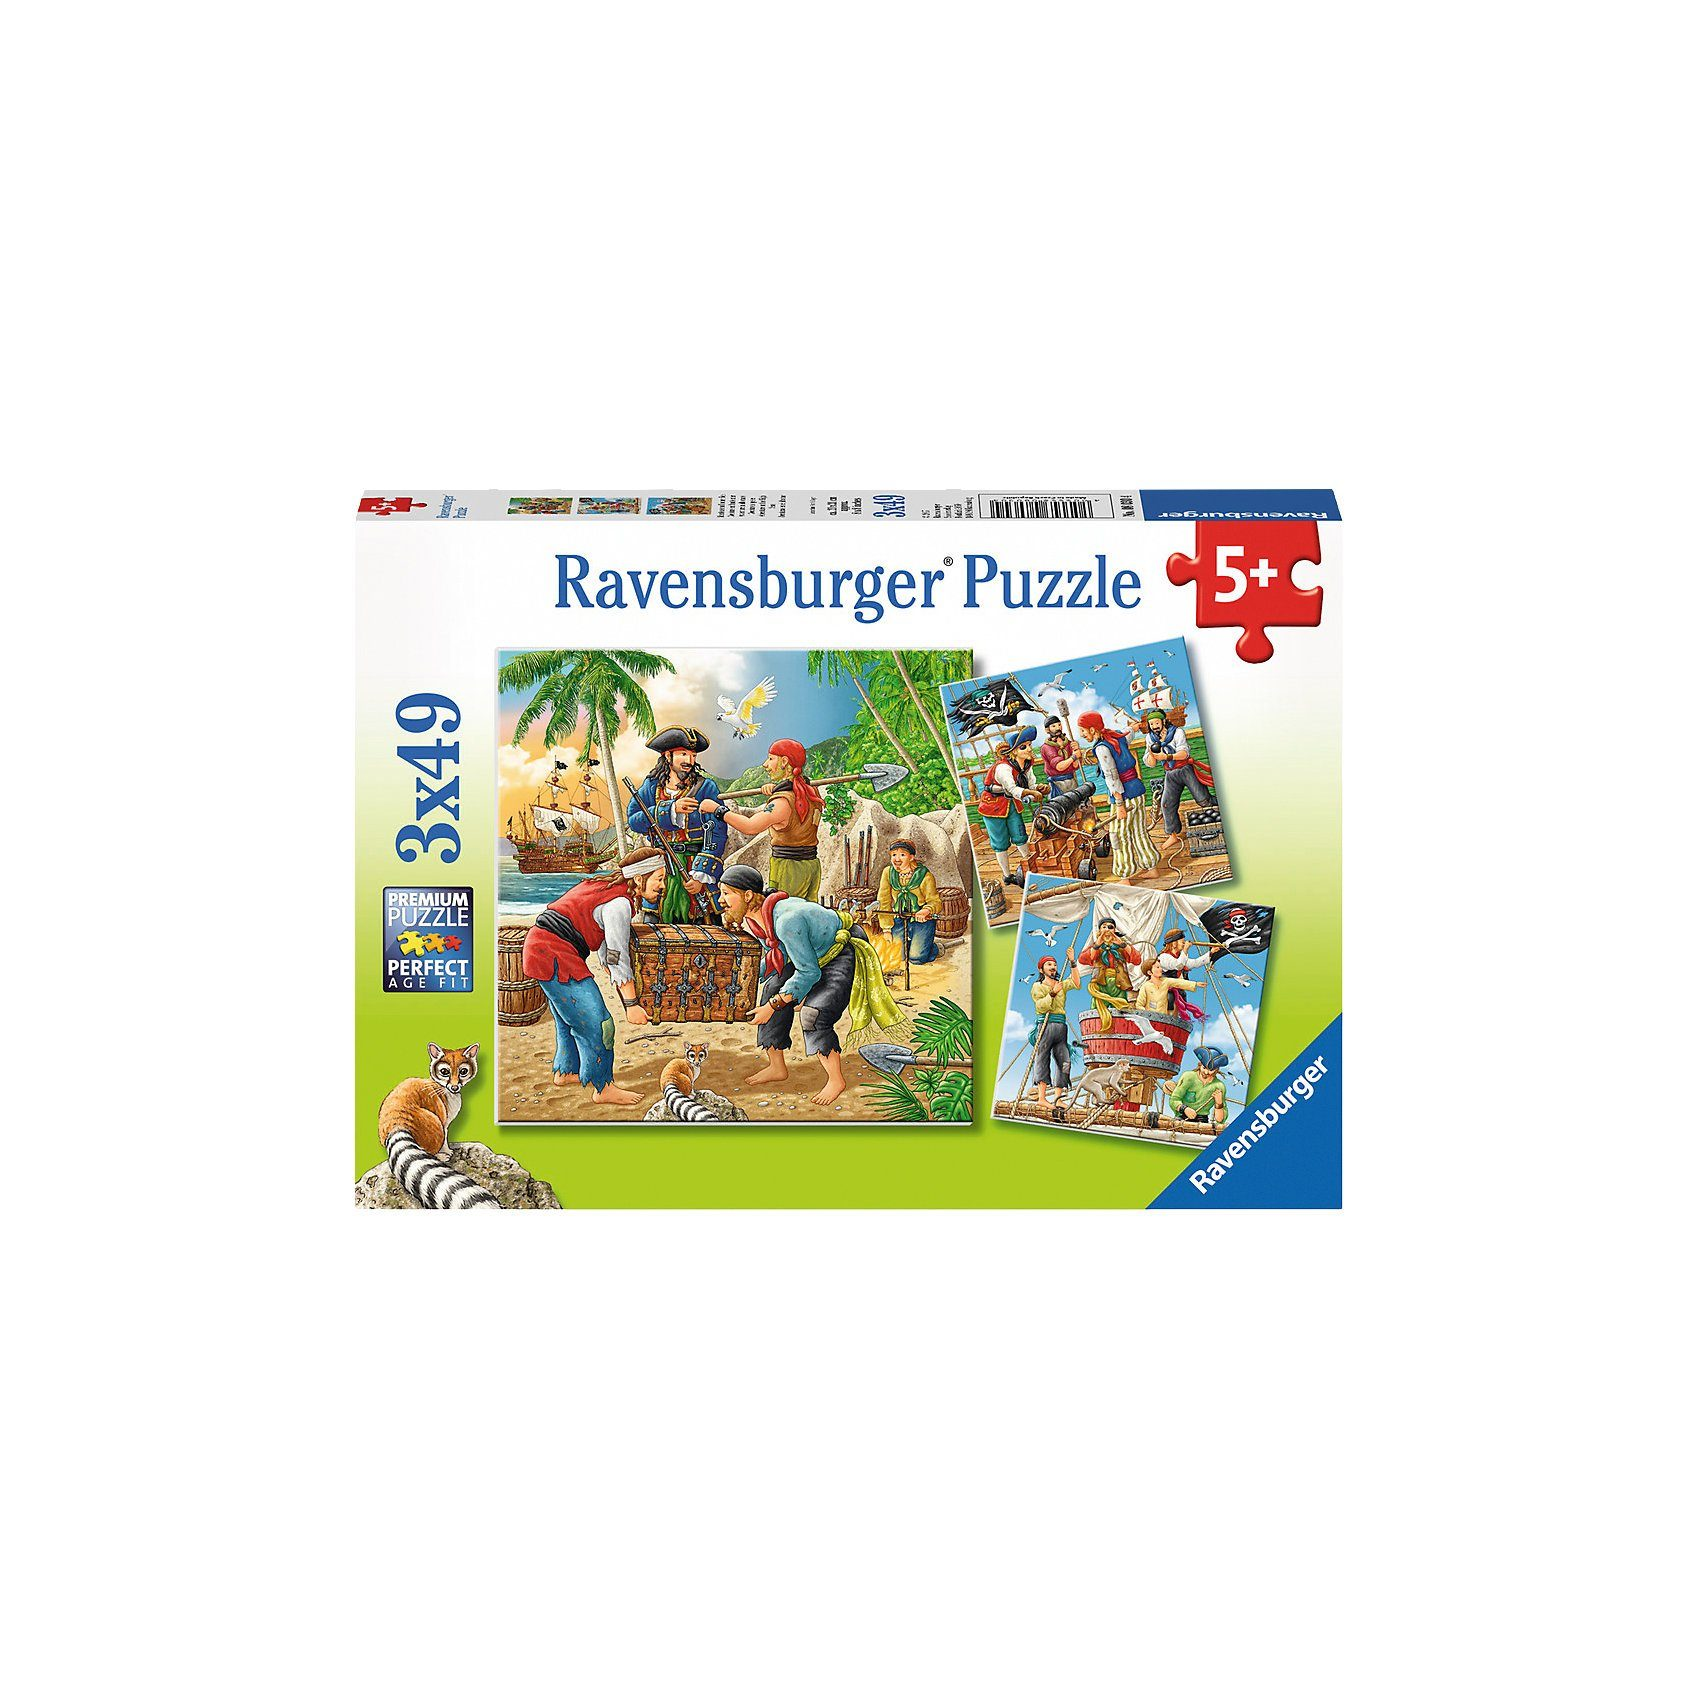 Ravensburger Abenteuer auf hoher See 3 X 49 Teile Puzzle